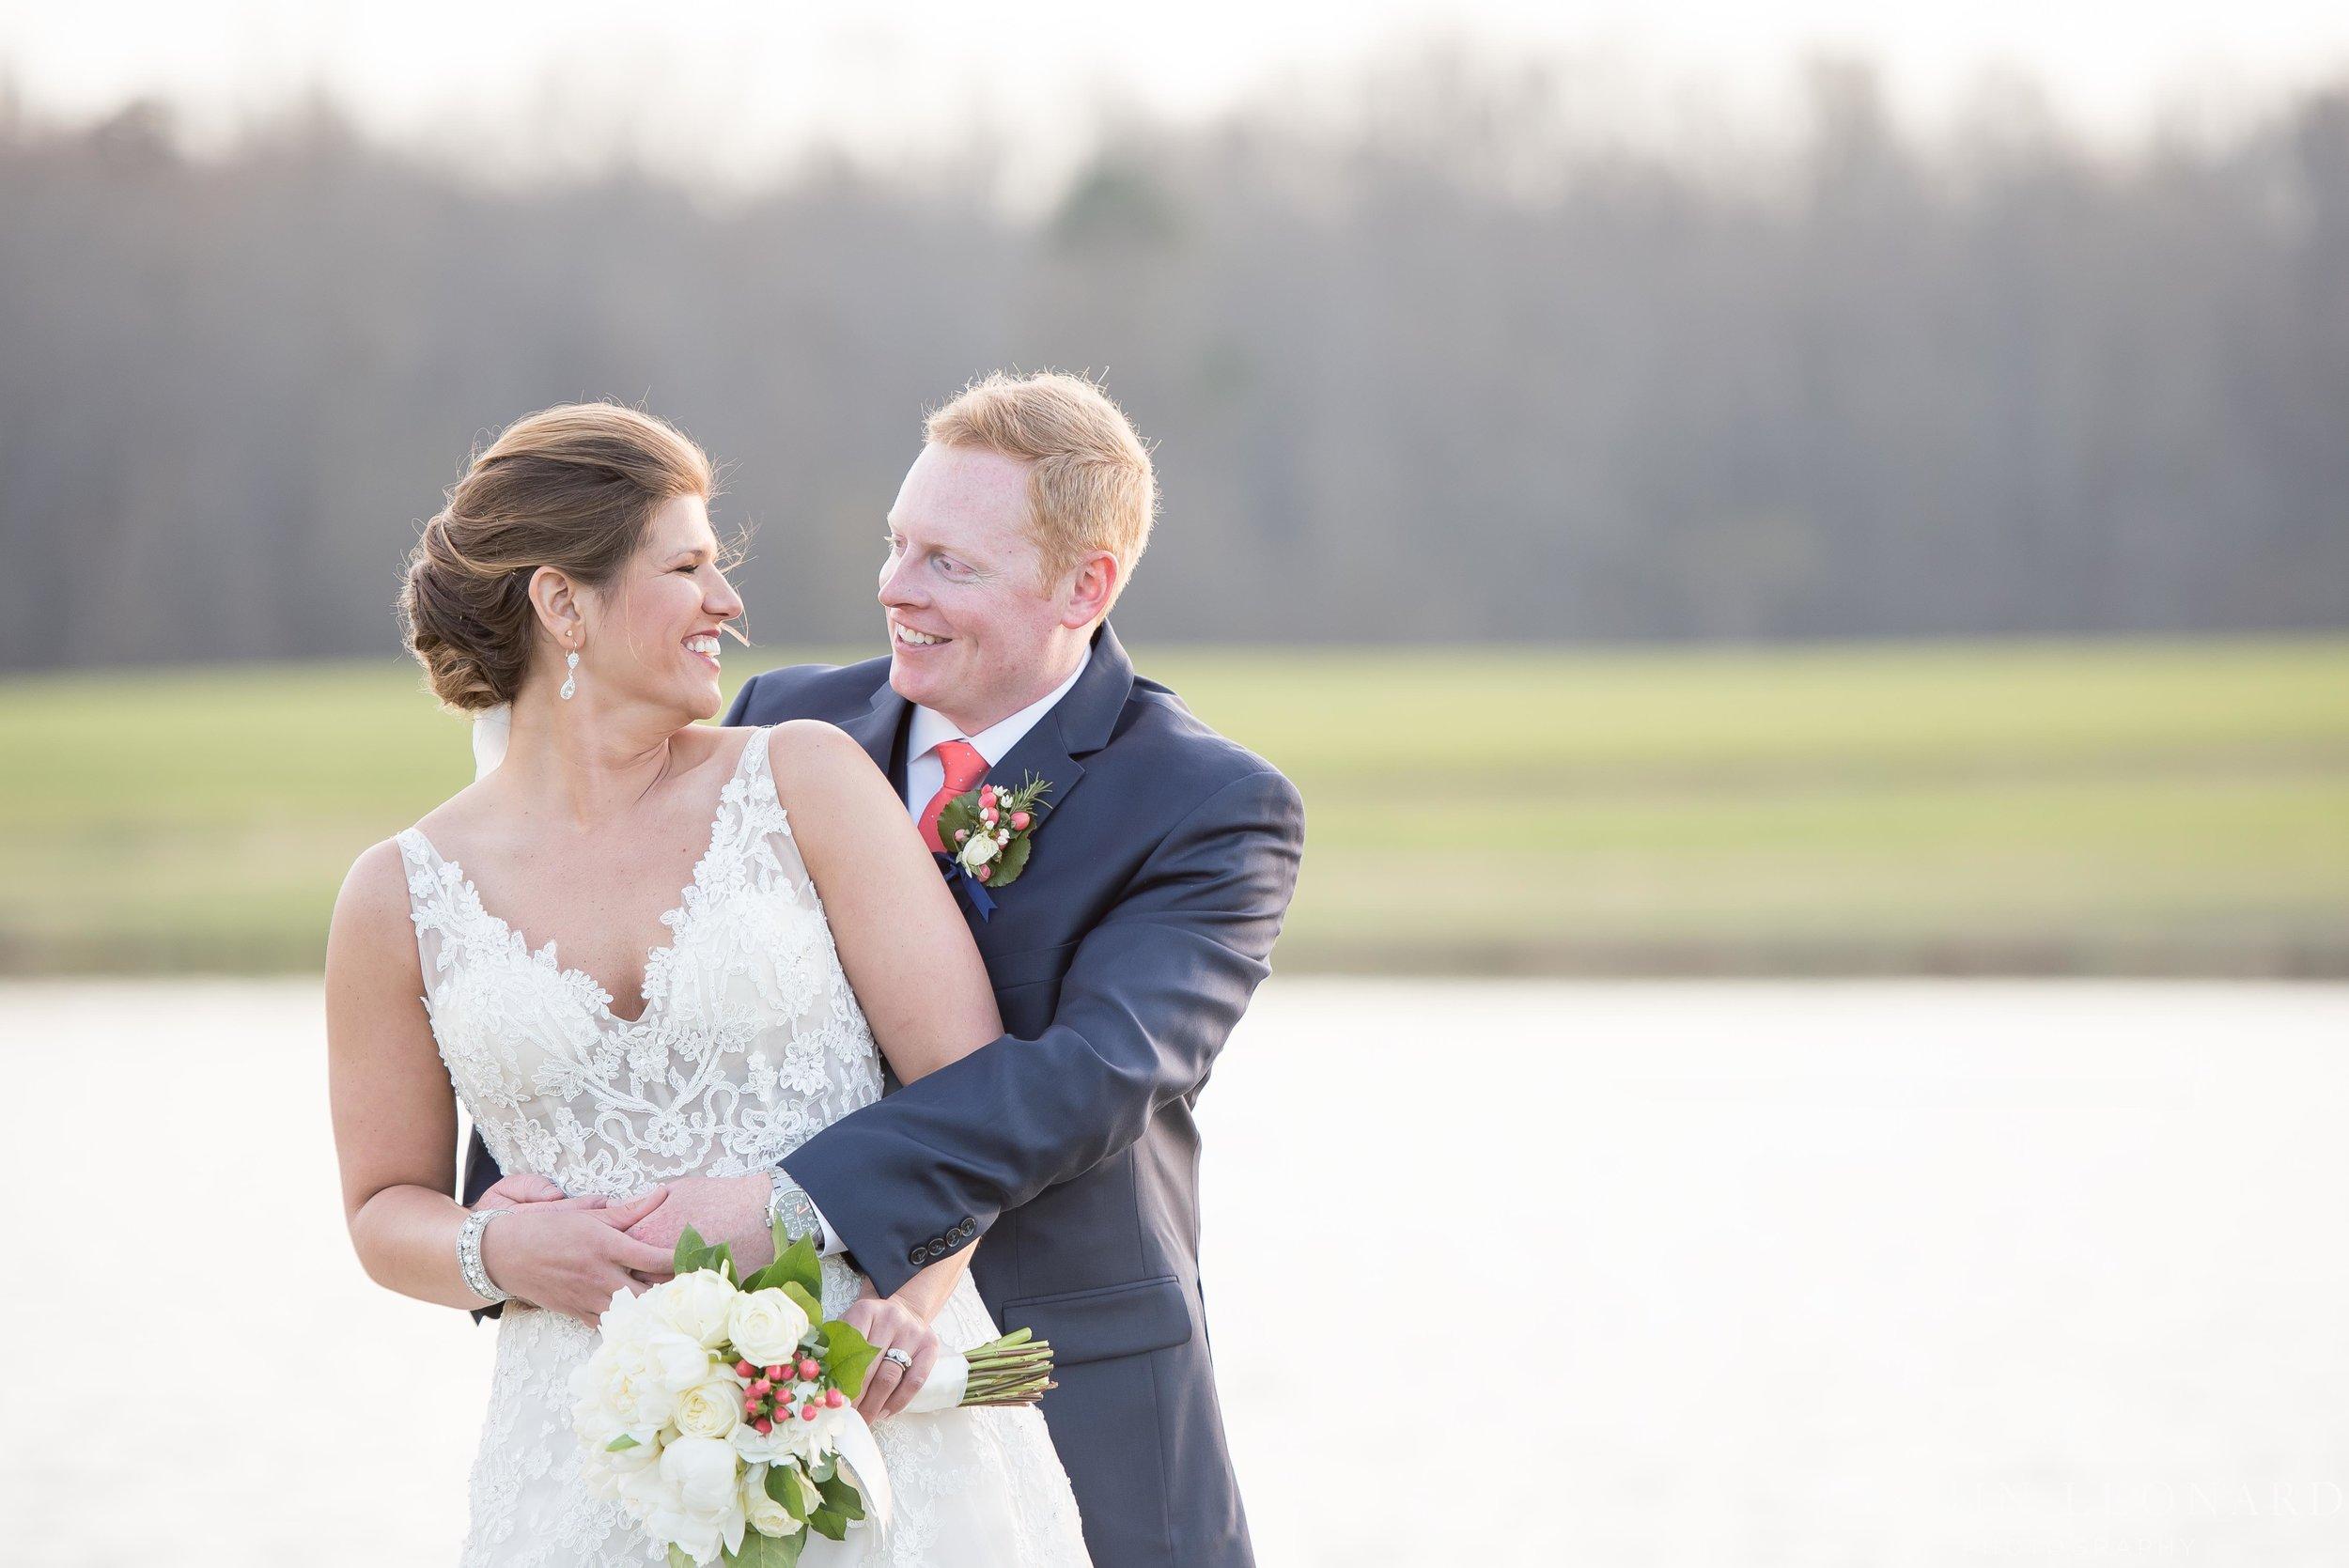 Adaumont Farm - Adaumont Farm Weddings - Trinity Weddings - NC Weddings - Yasmin Leonard Photography-45.jpg